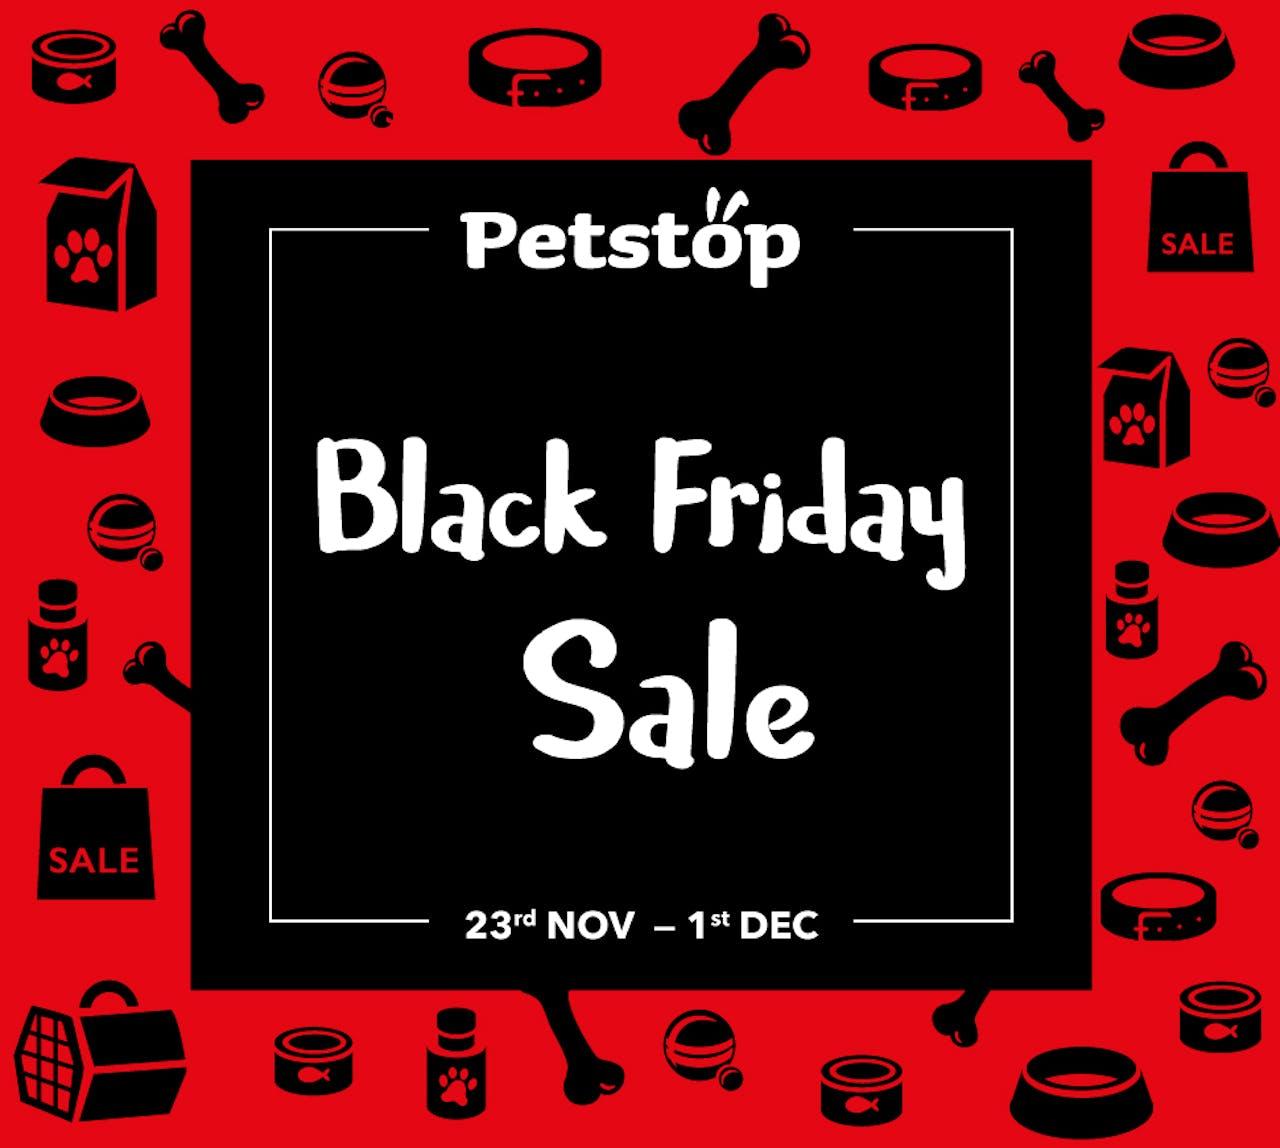 Petstop Black Friday Sale